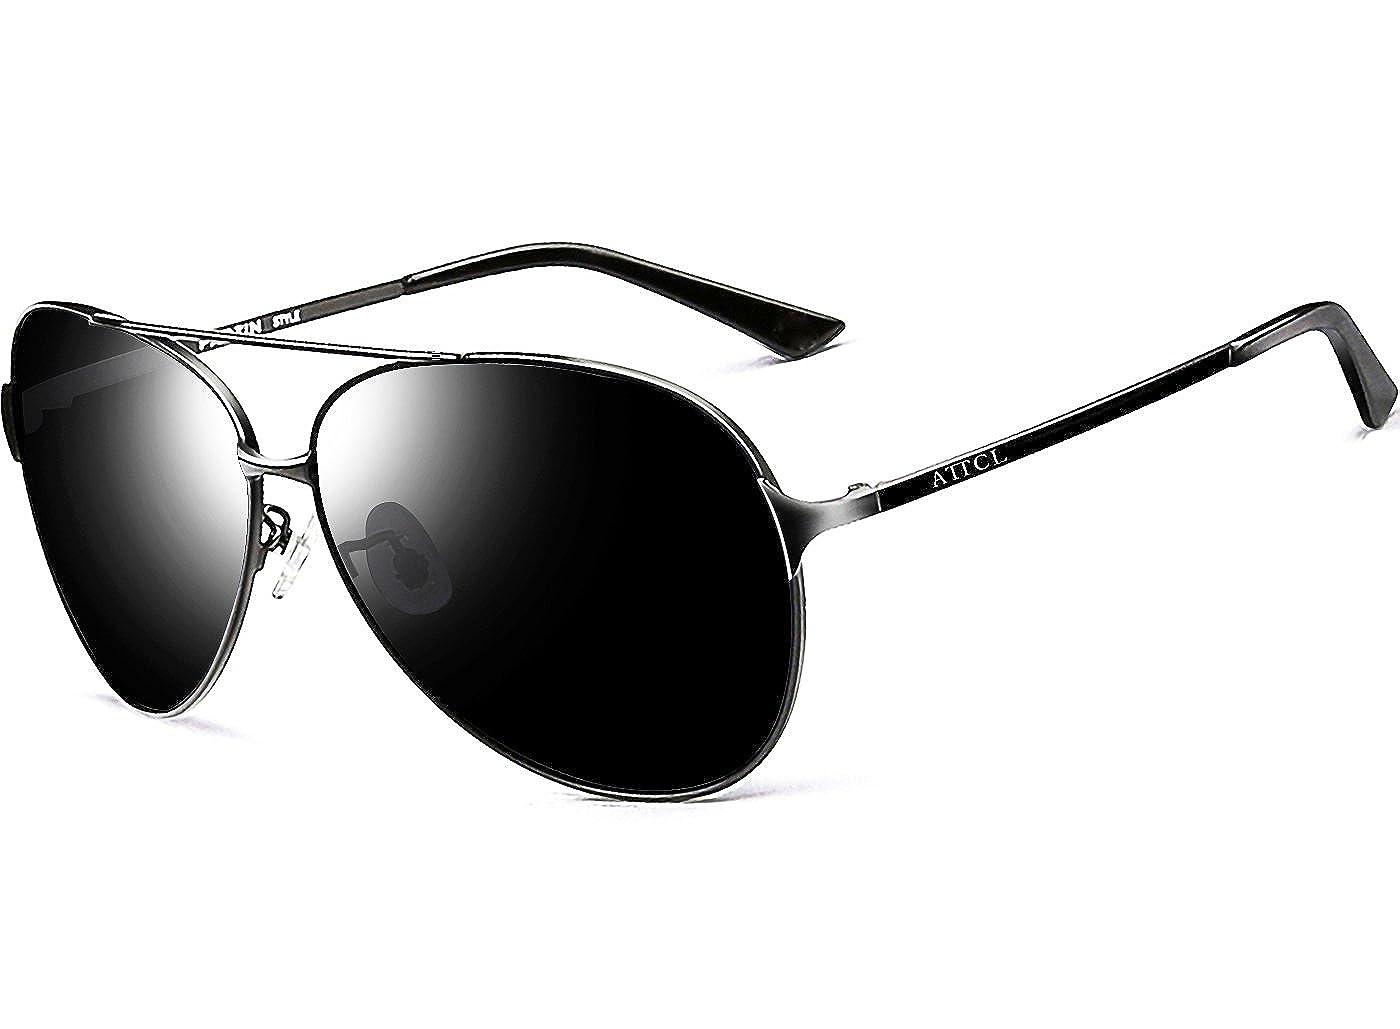 ATTCL Hombres Gafas De Sol Polarizadas Uv400 Súper Ligero Marco De Metal